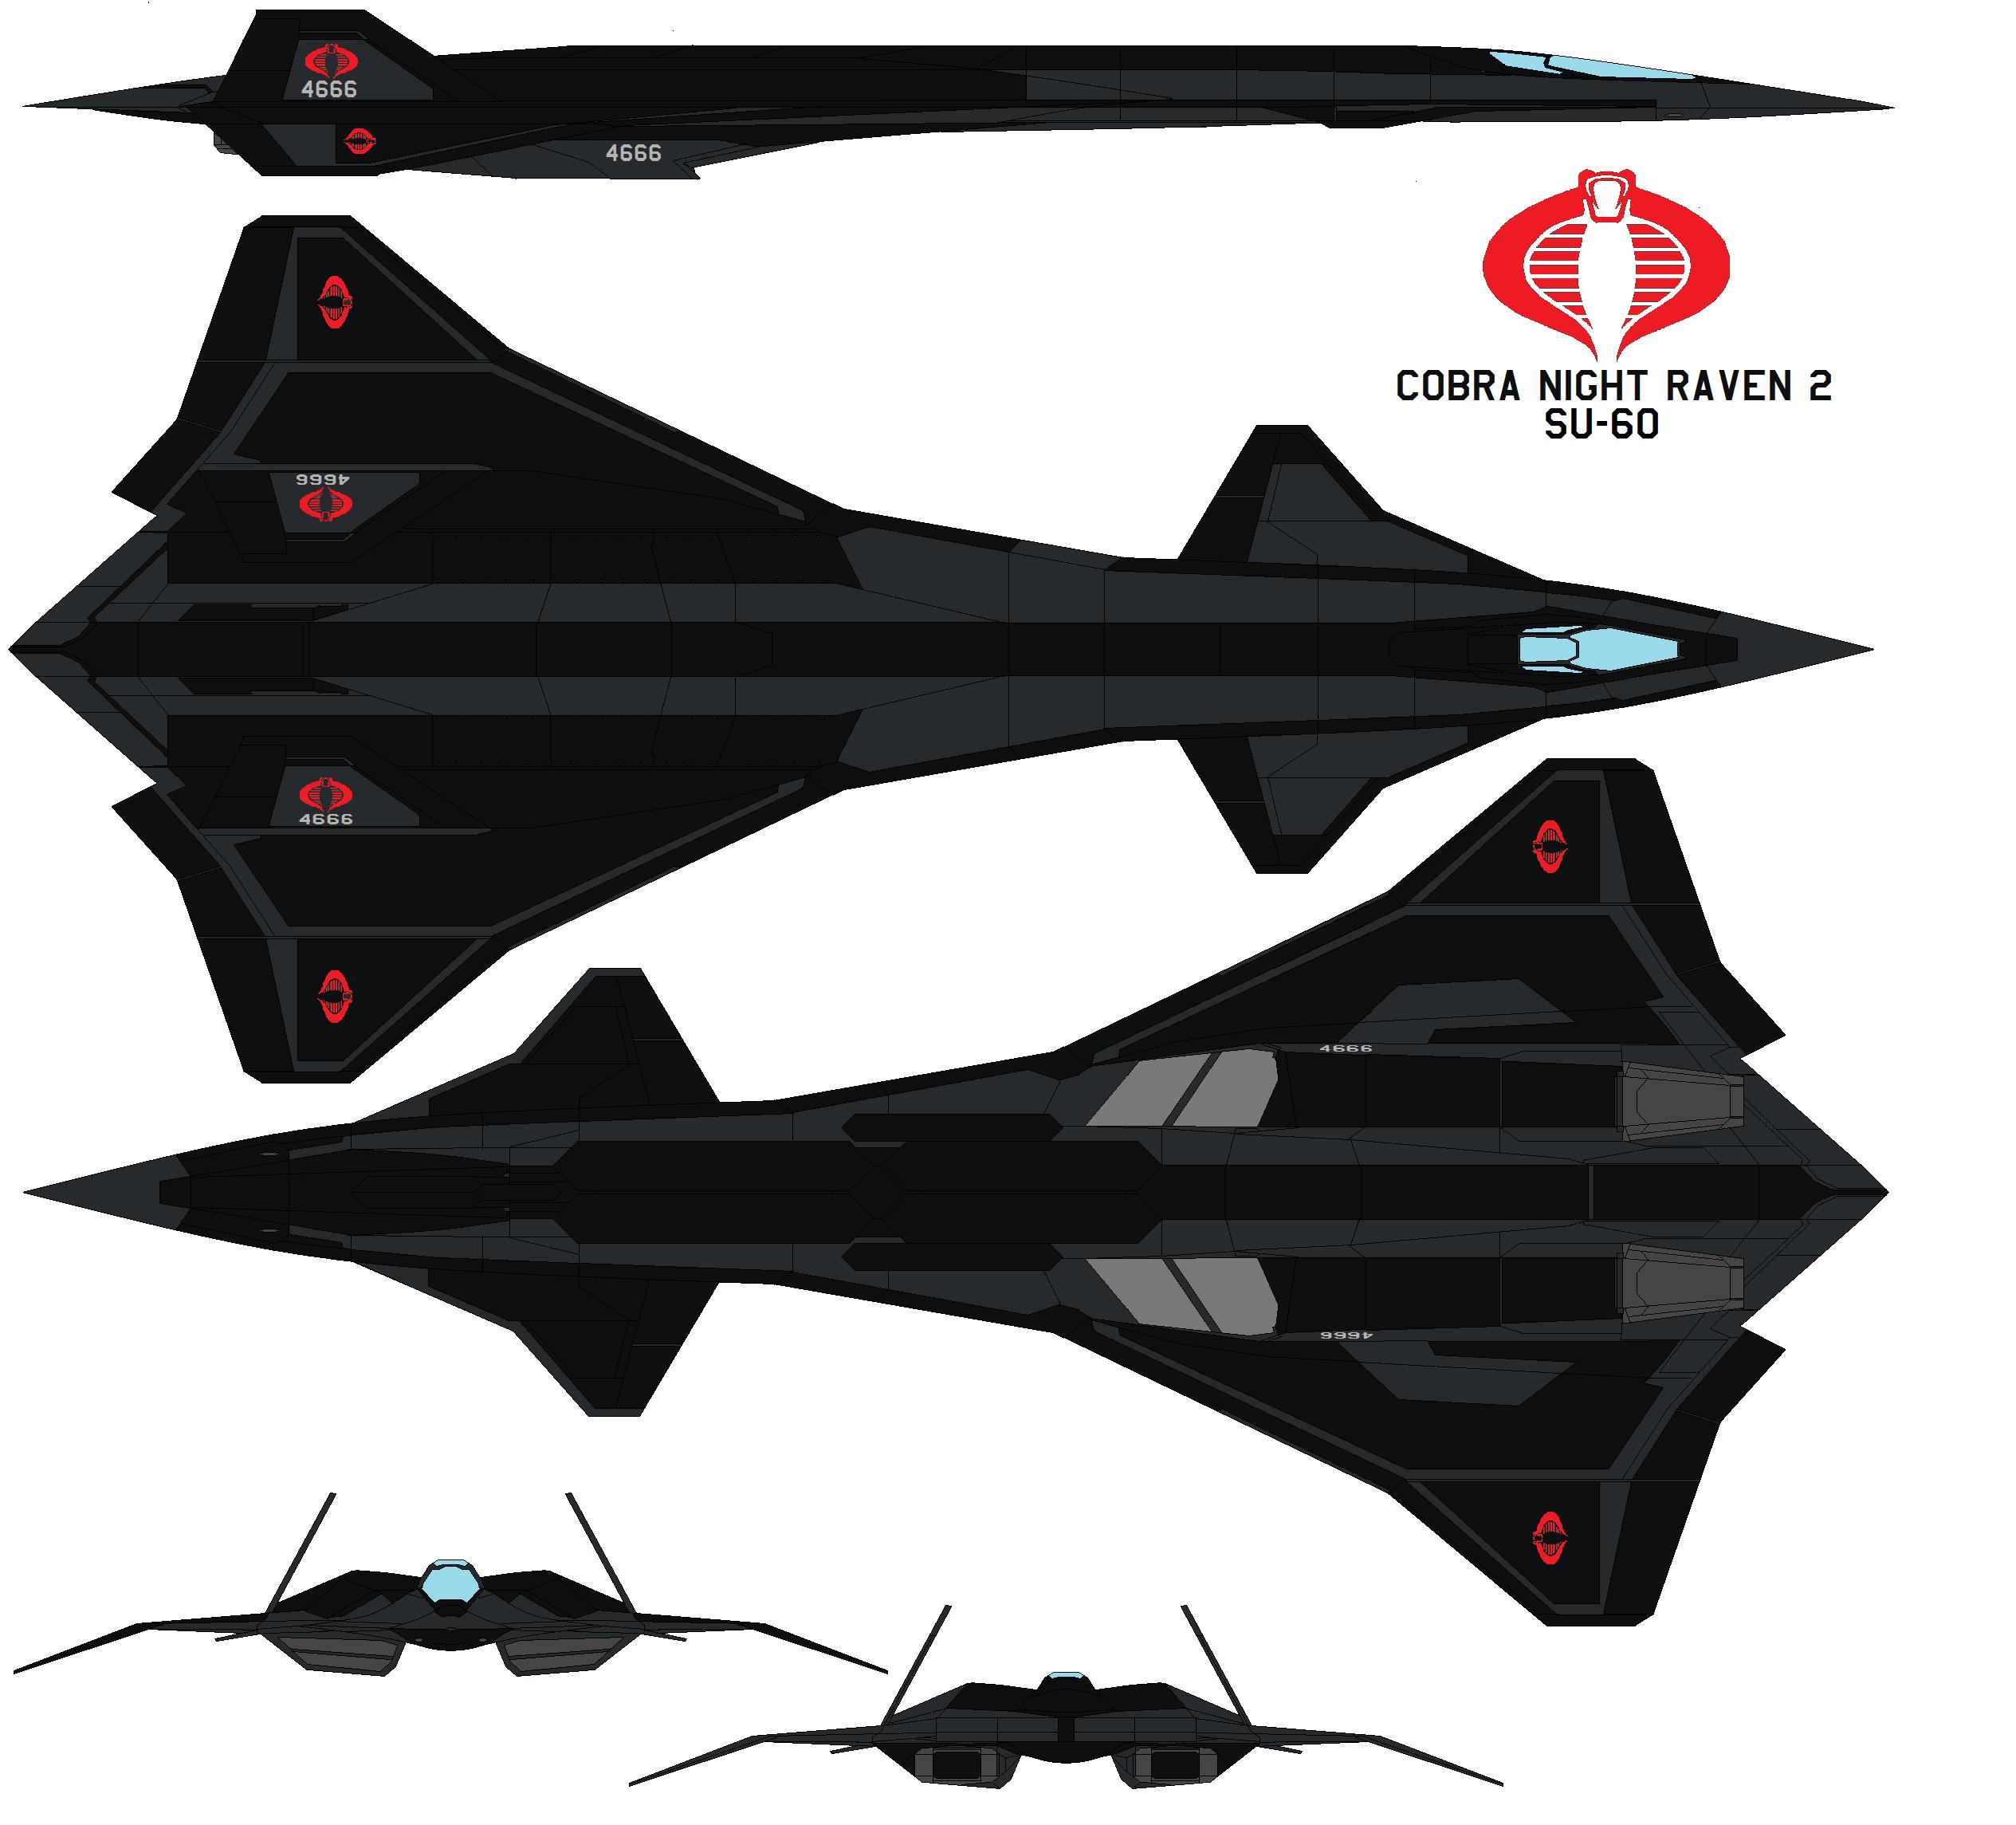 Cobra Night Raven 2 SU-60 By Bagera3005 On DeviantArt